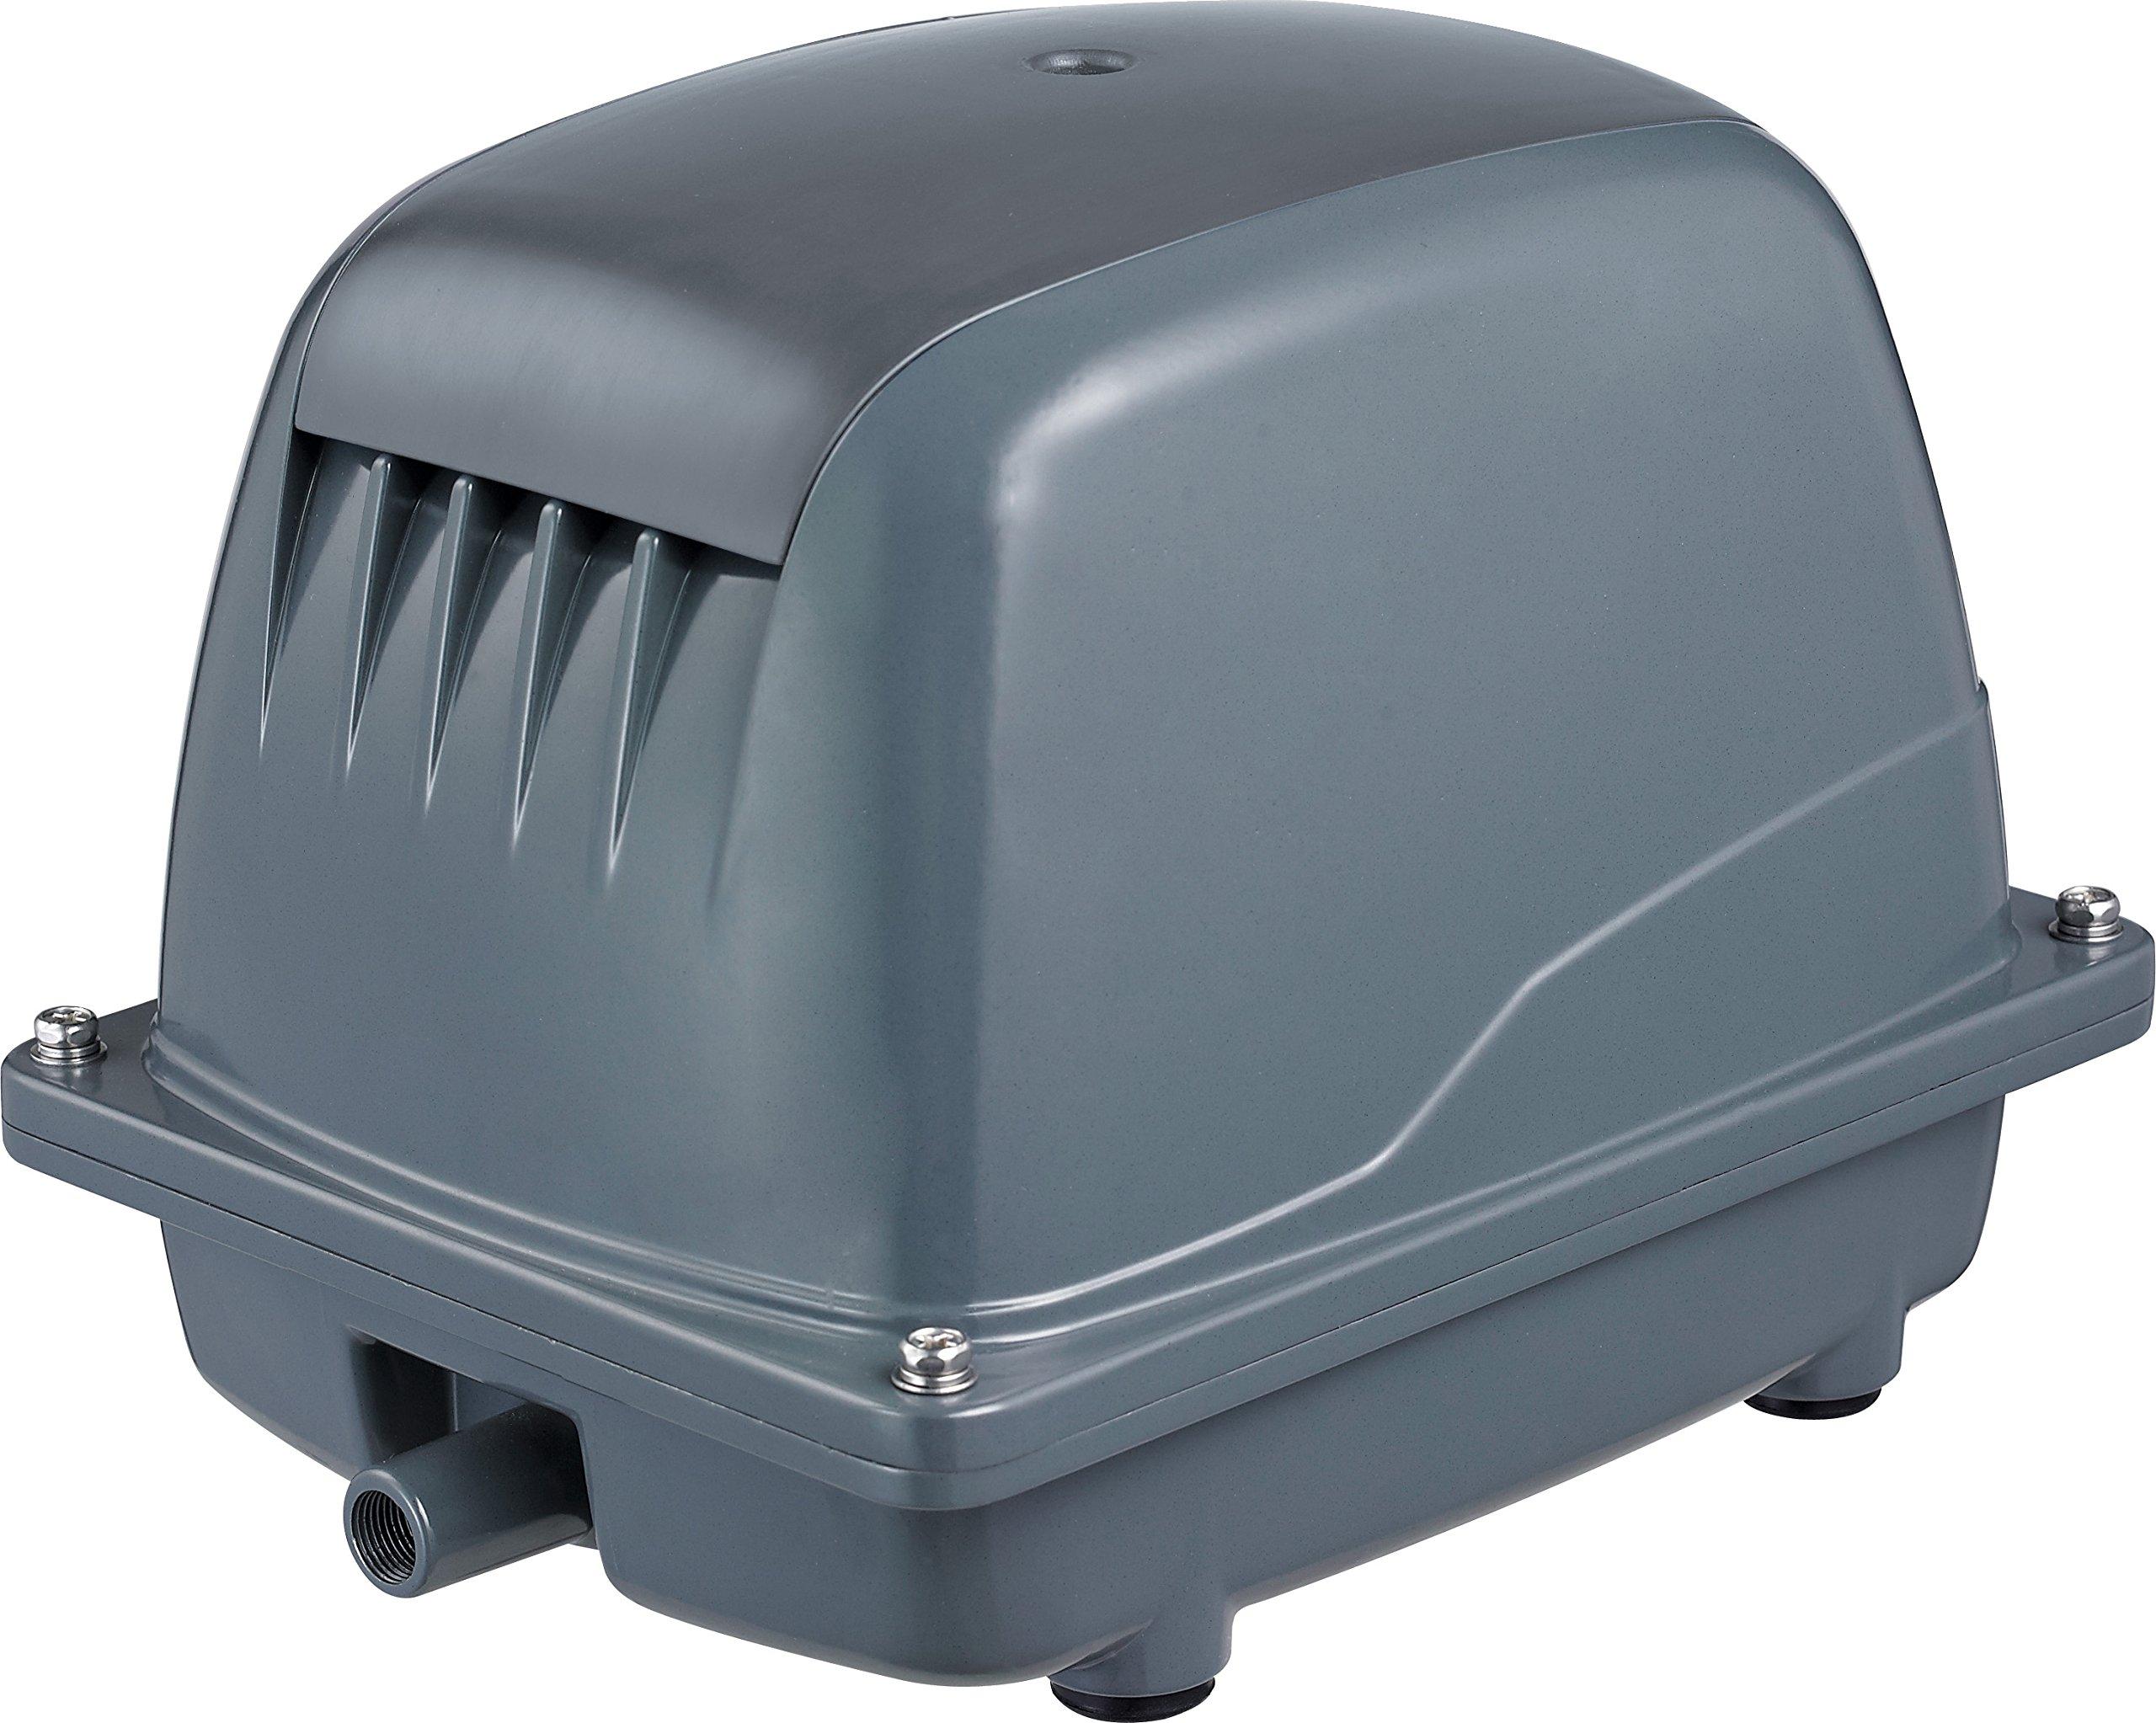 Splashproof outdoor air pump pond oxygenator waterproof for Yard pond pumps